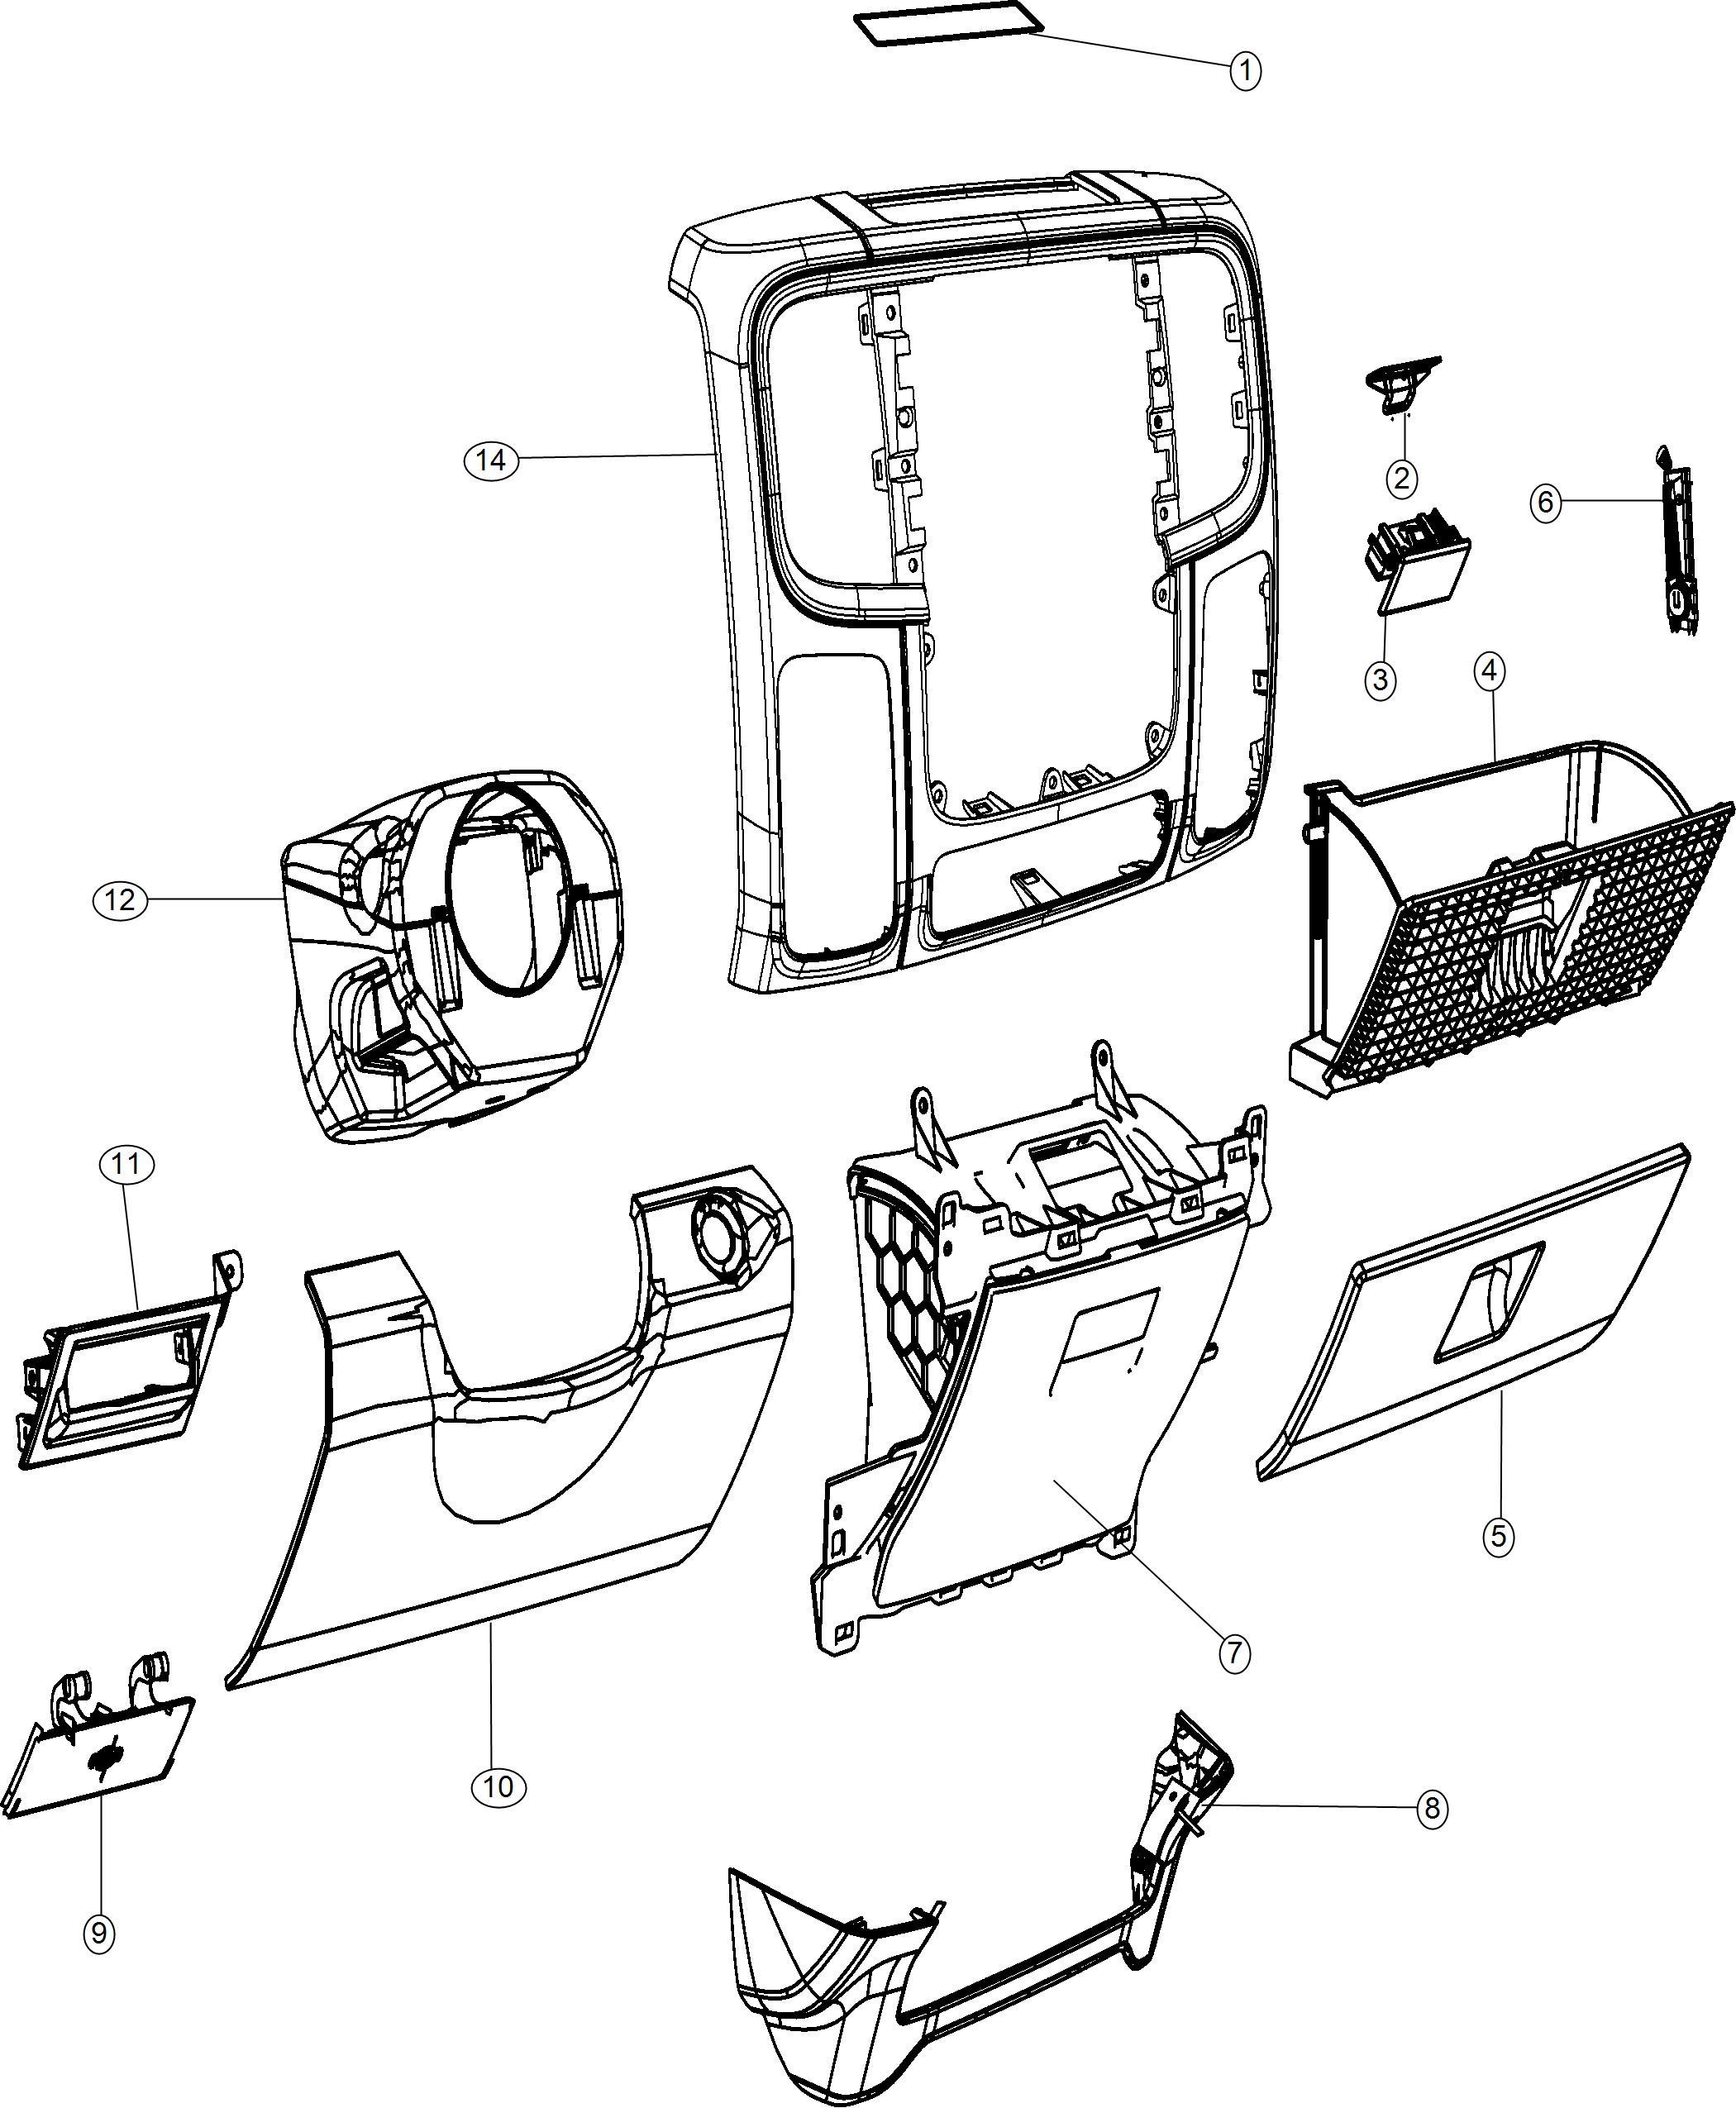 Ram Shroud Steering Column Trim No Description